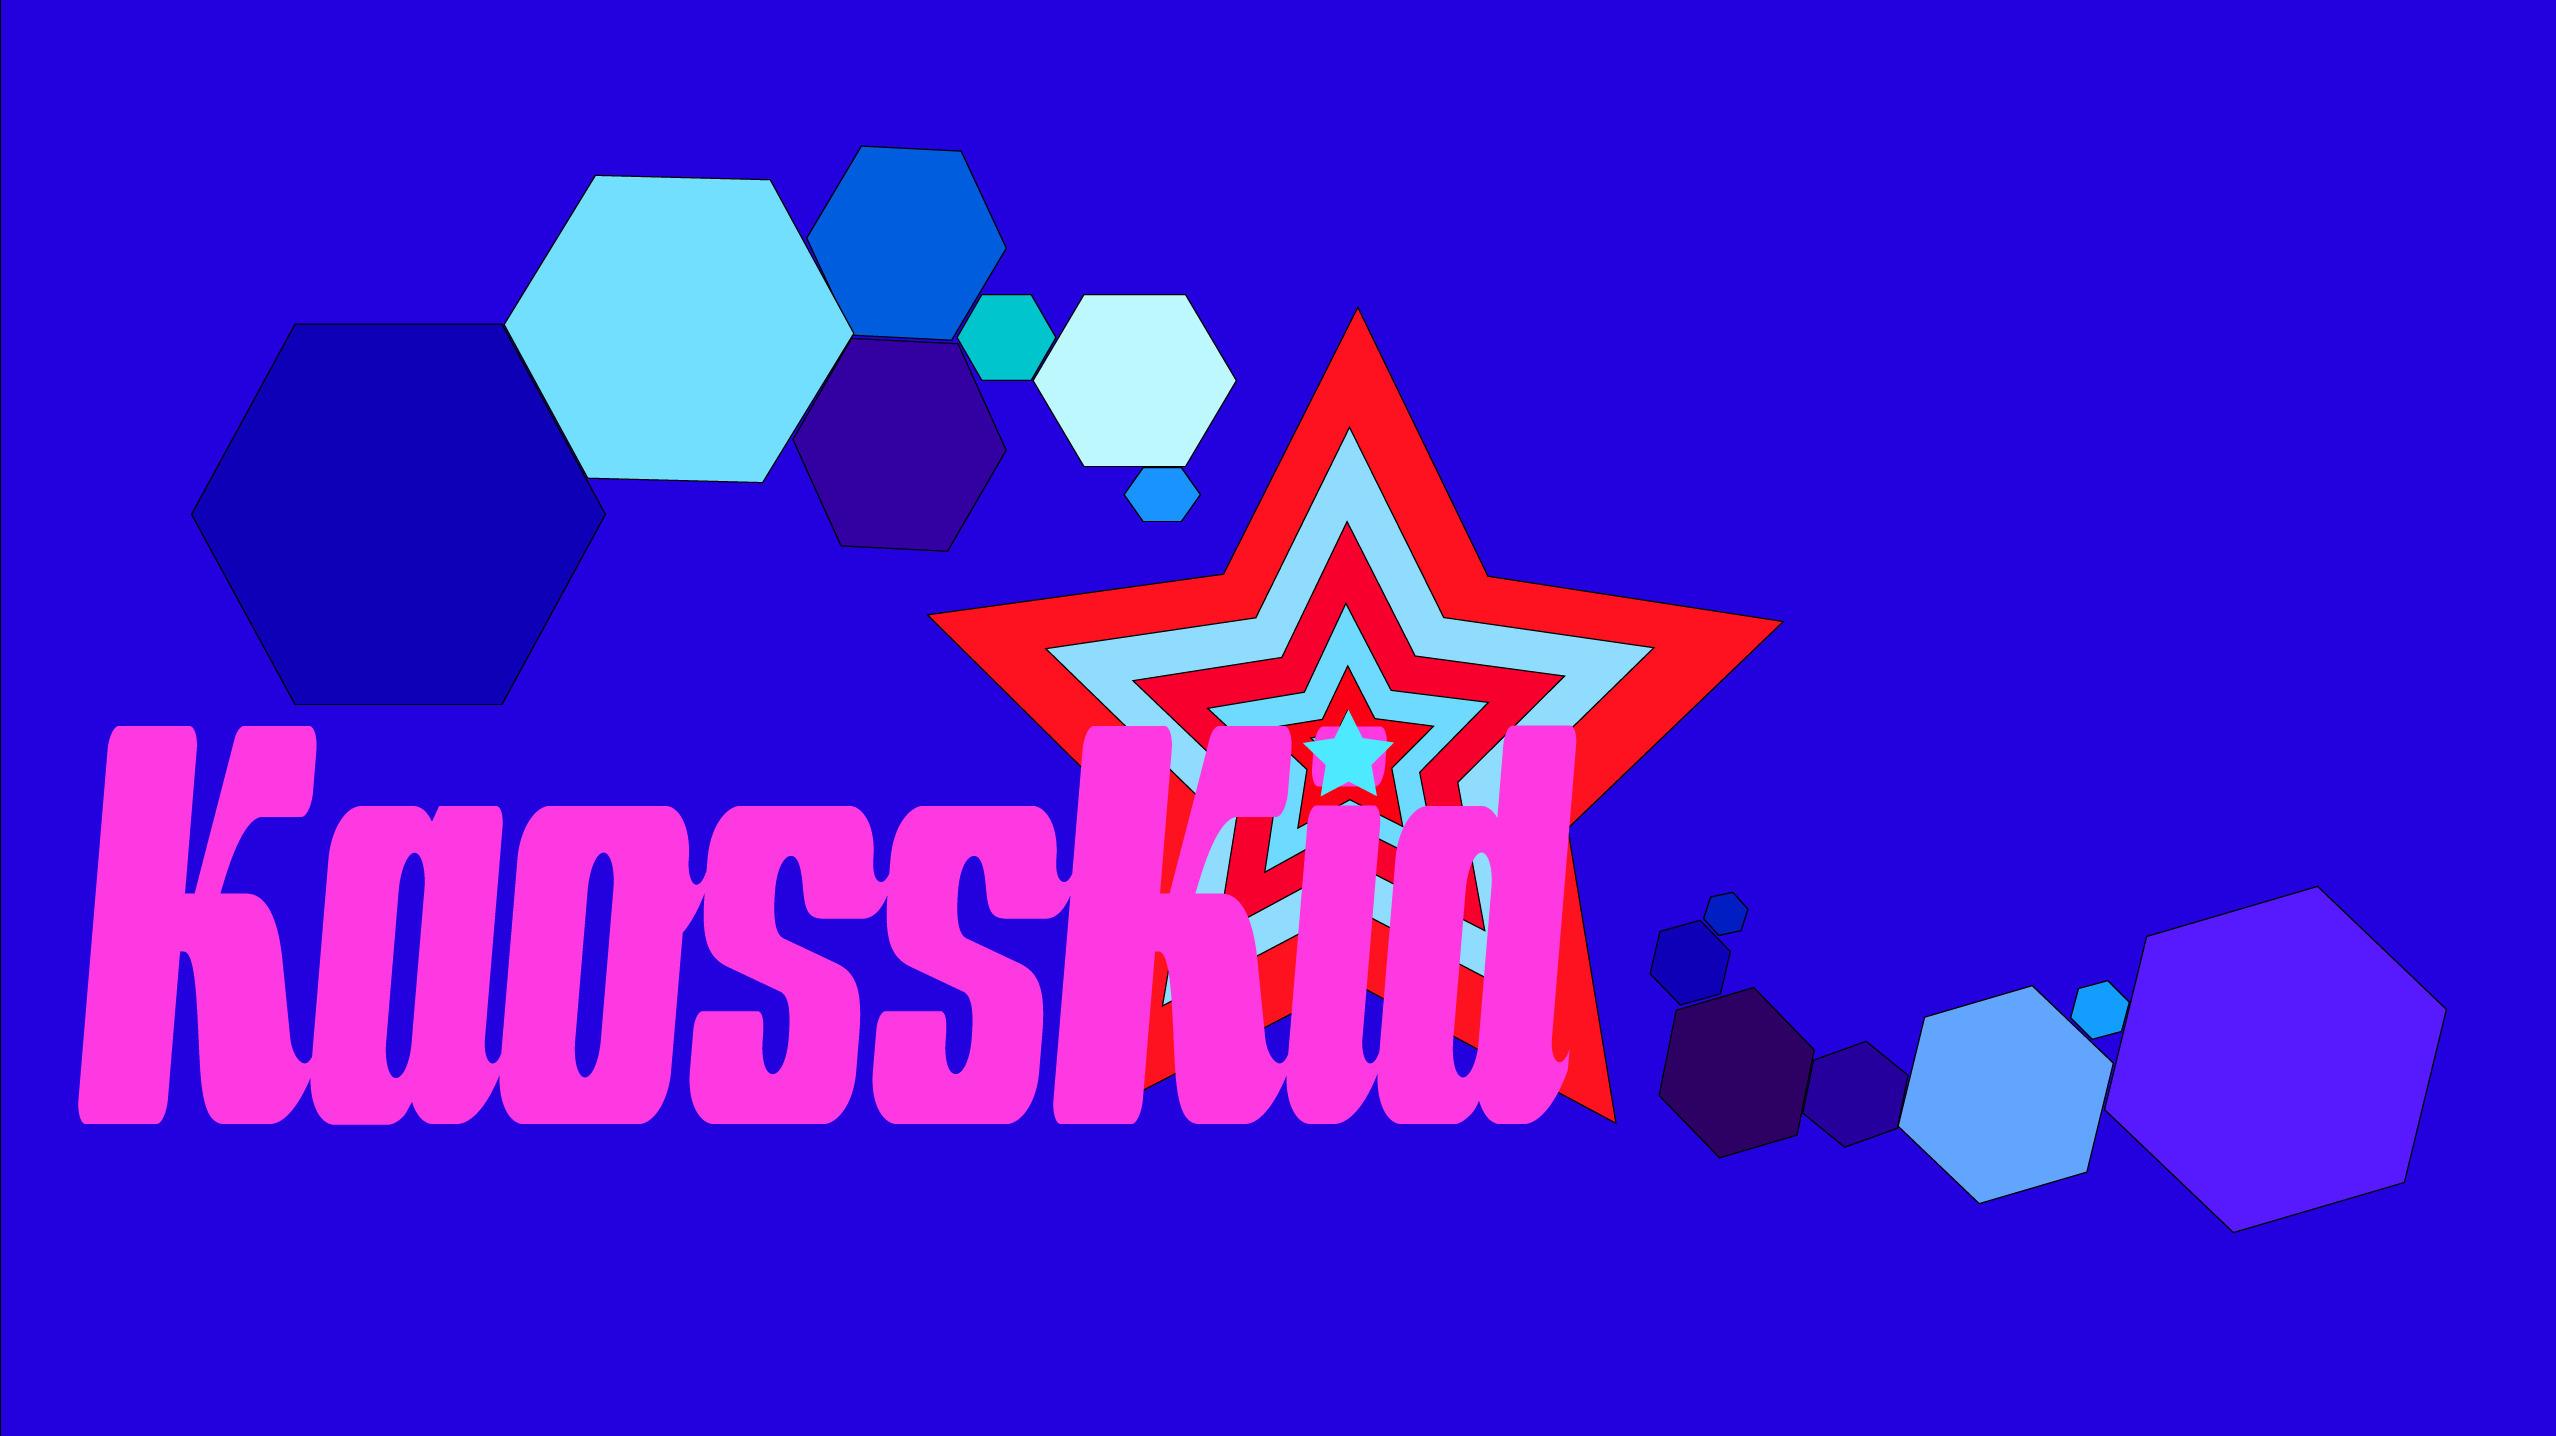 KaossKid (Ginga Paul Gladman) (@kaosskid) Cover Image